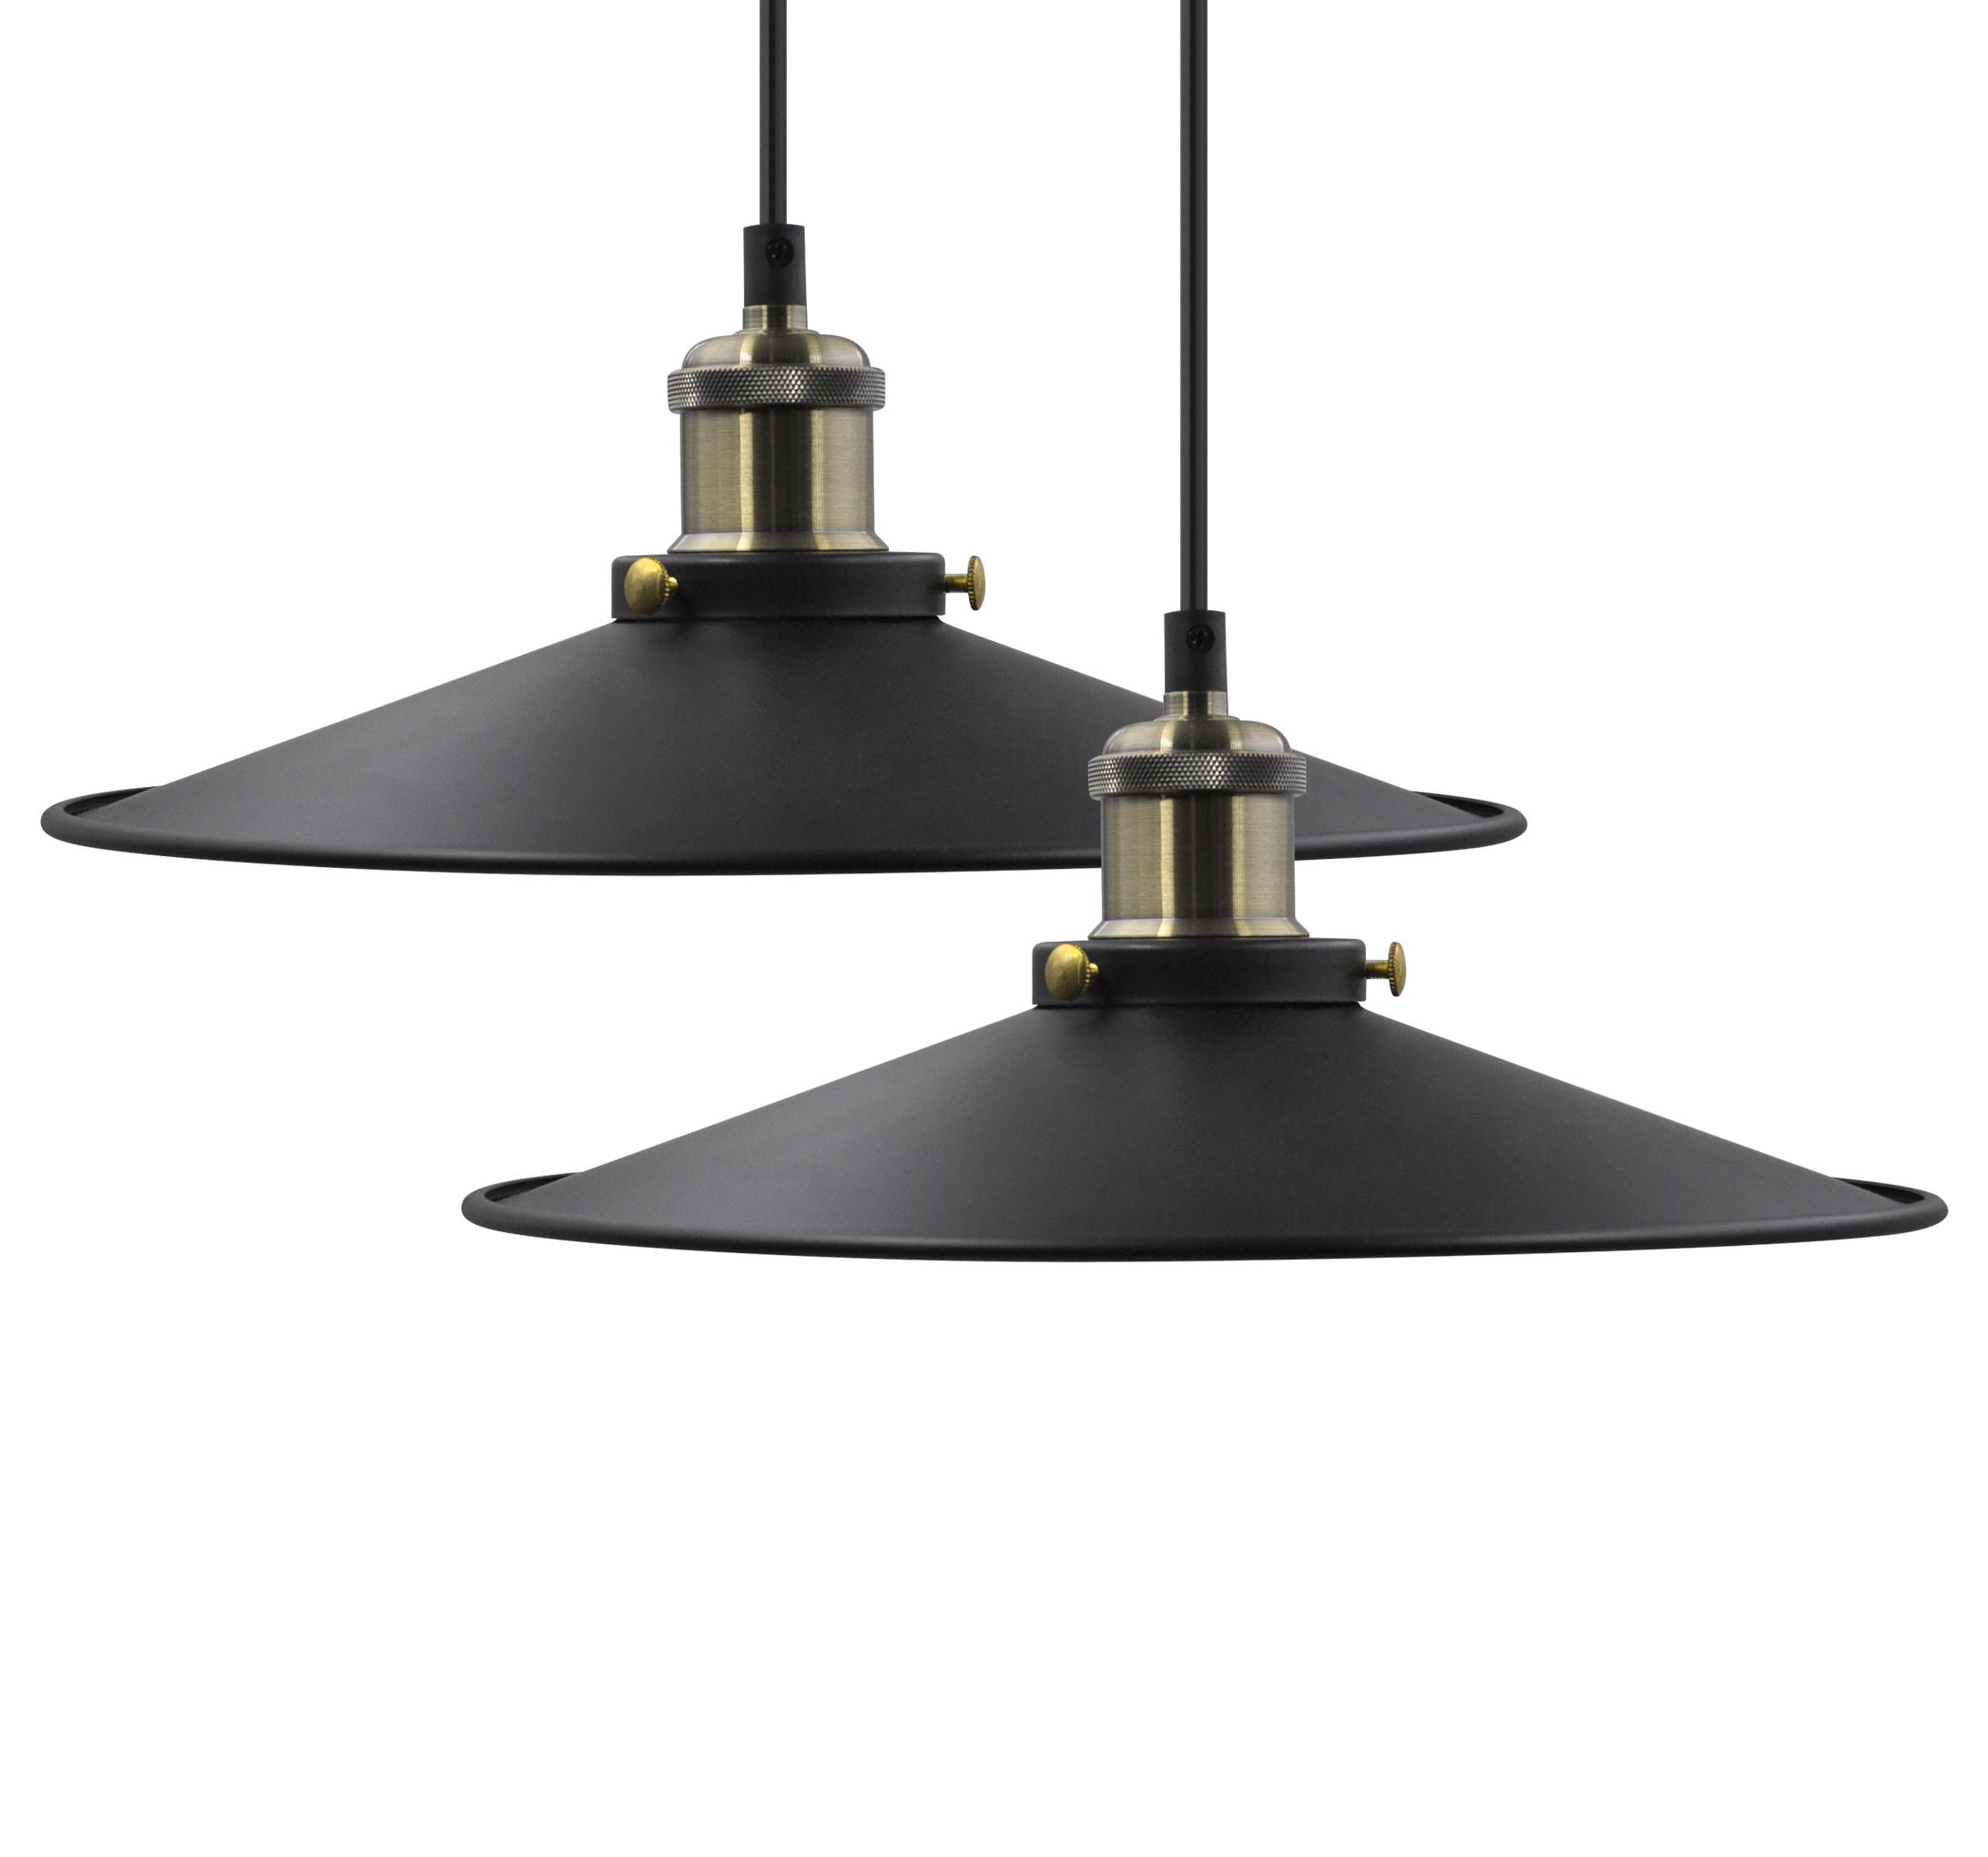 Black Vintage Ceiling Long Hanging Pendant Lights Suspended Lamps Fixtures For Dining Room Kitchen Island Restaurant Maximum 2 Meters Suspension